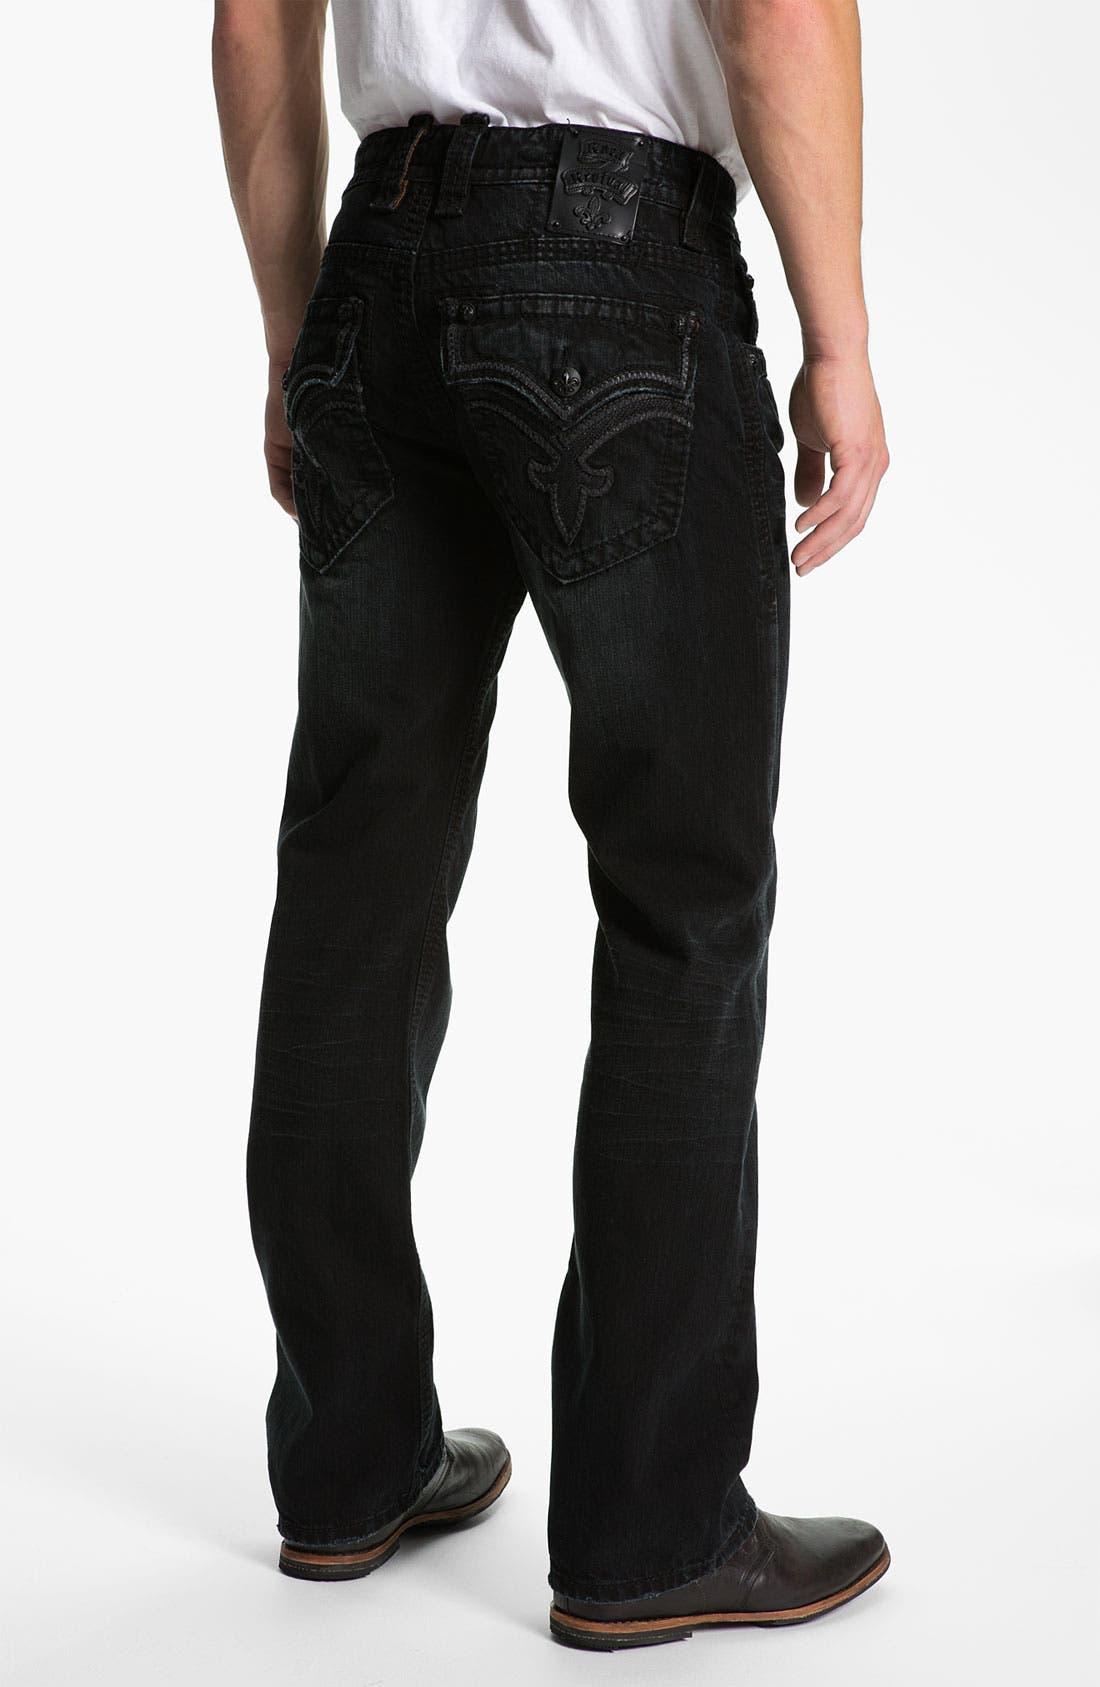 Alternate Image 1 Selected - Rock Revival 'Bob' Straight Leg Jeans (Black)